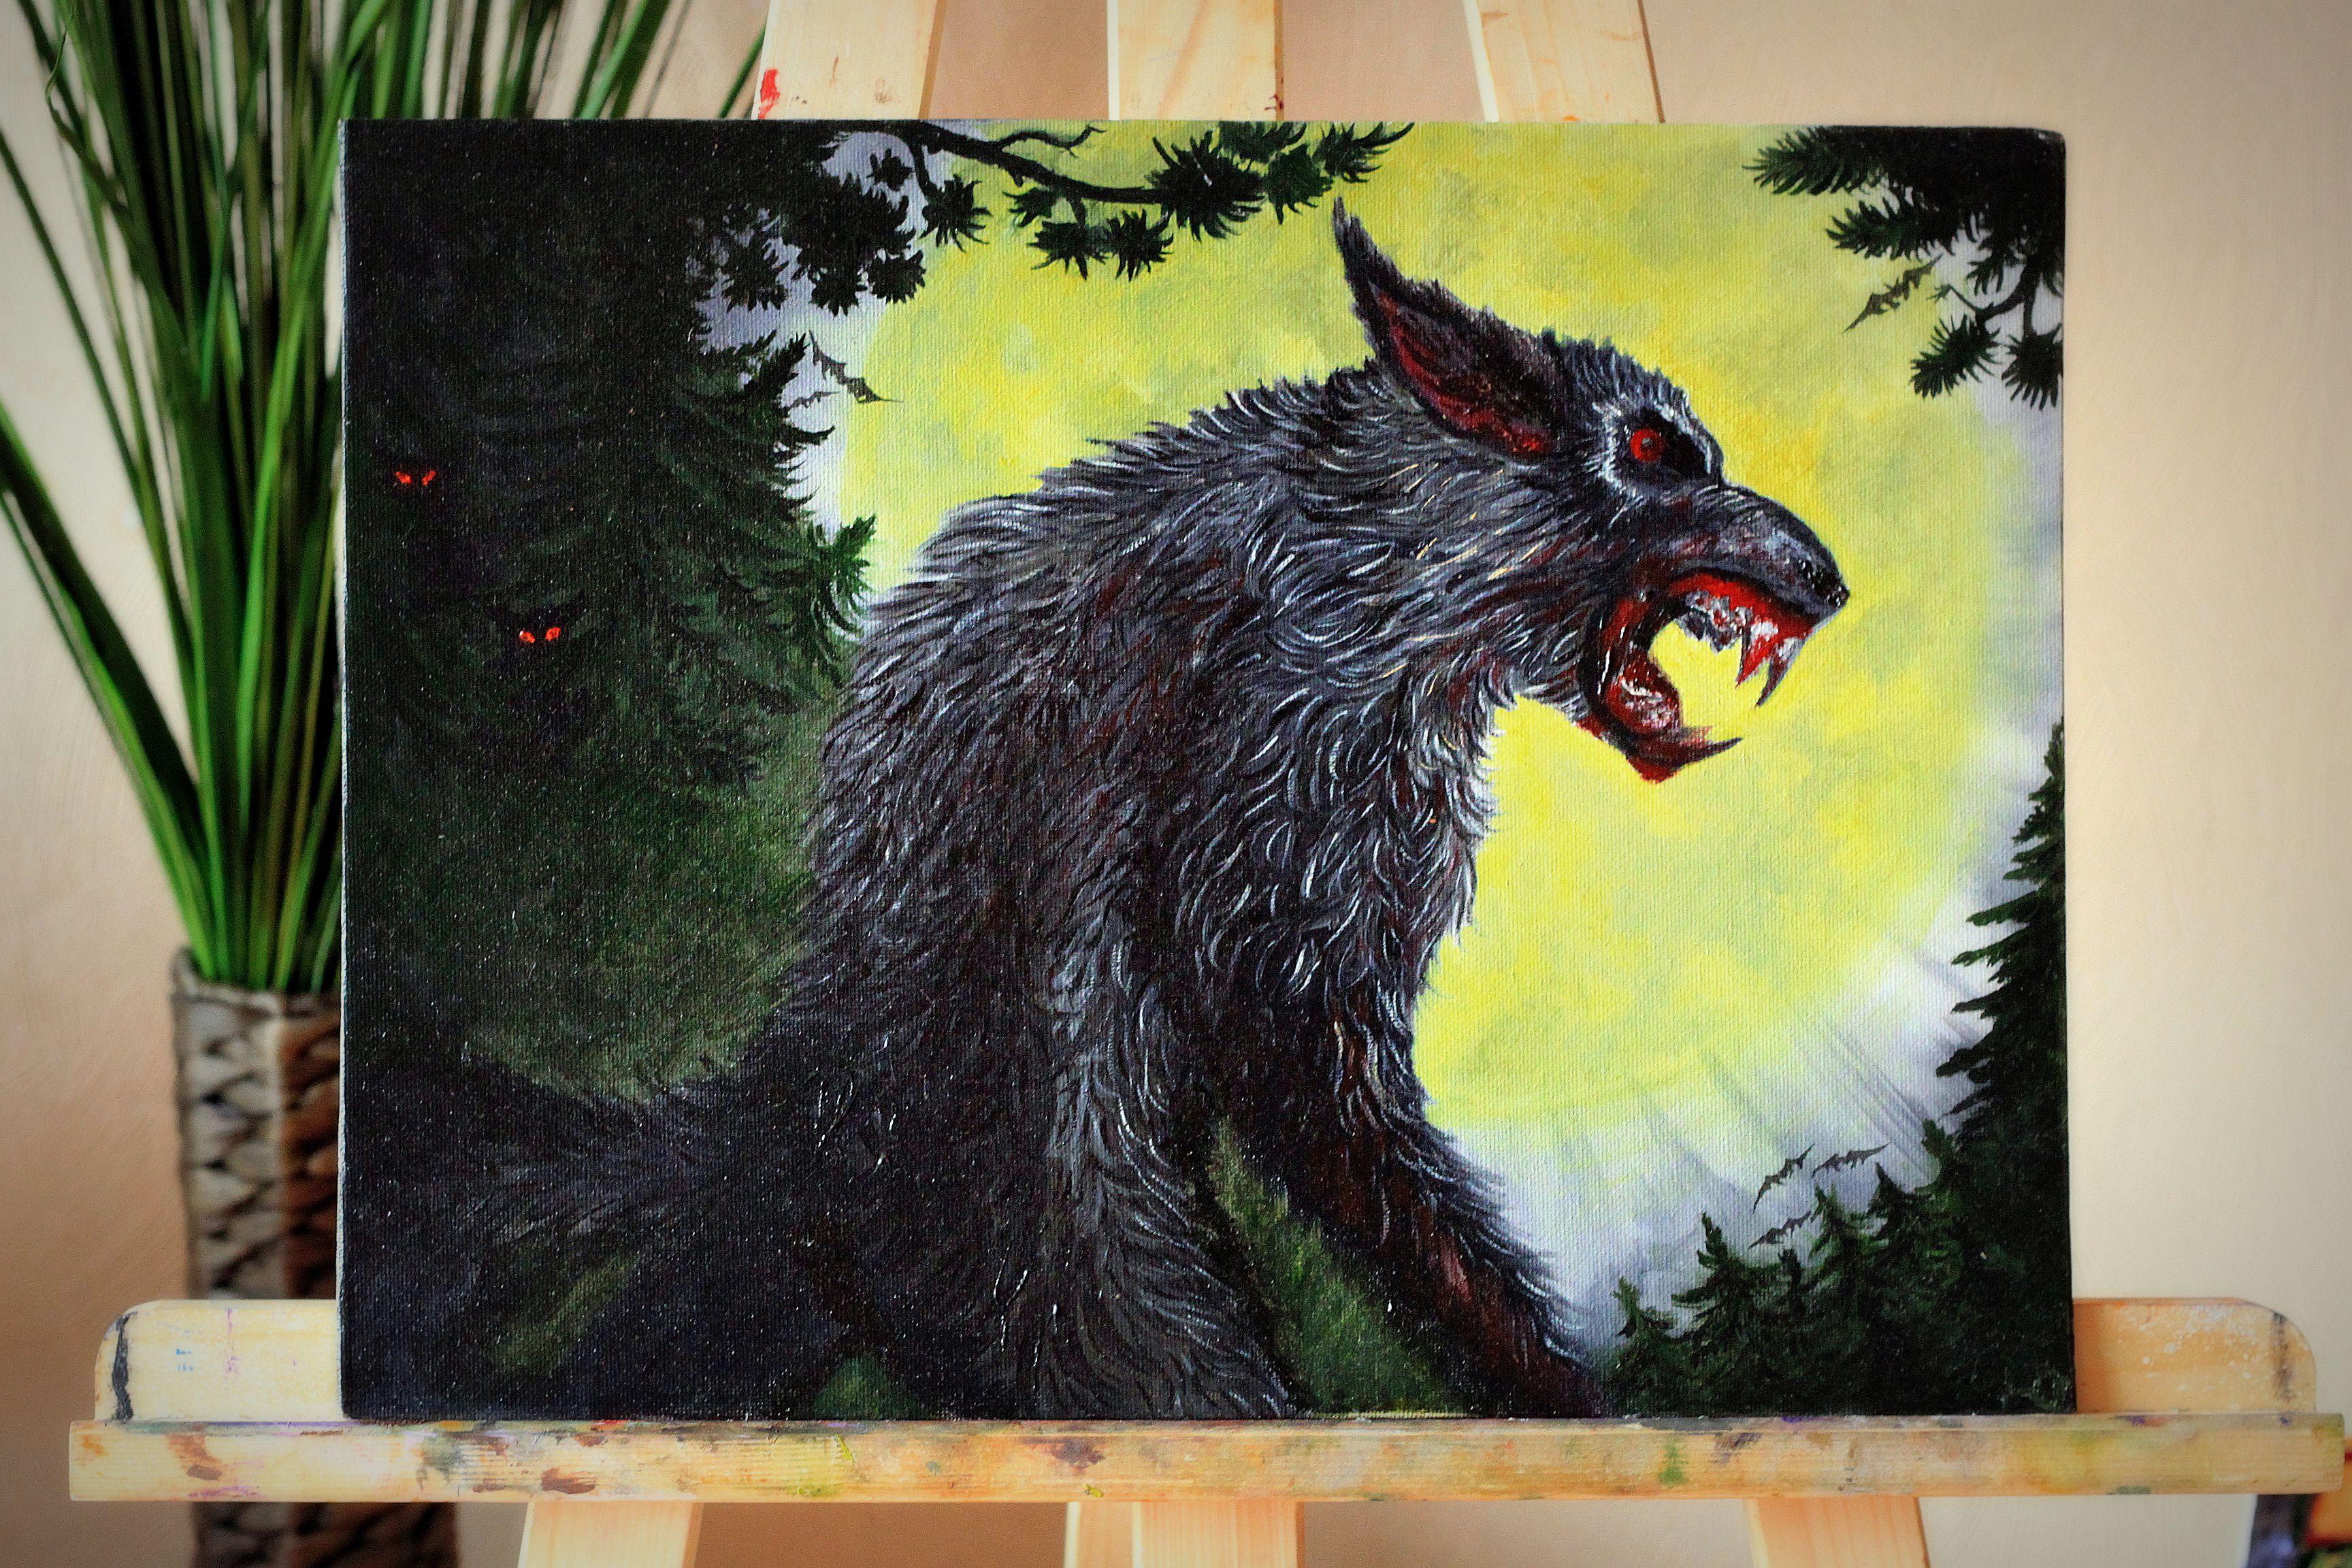 холст ночь луна магия полнолуние оборотень мало кровь лес волки мистика